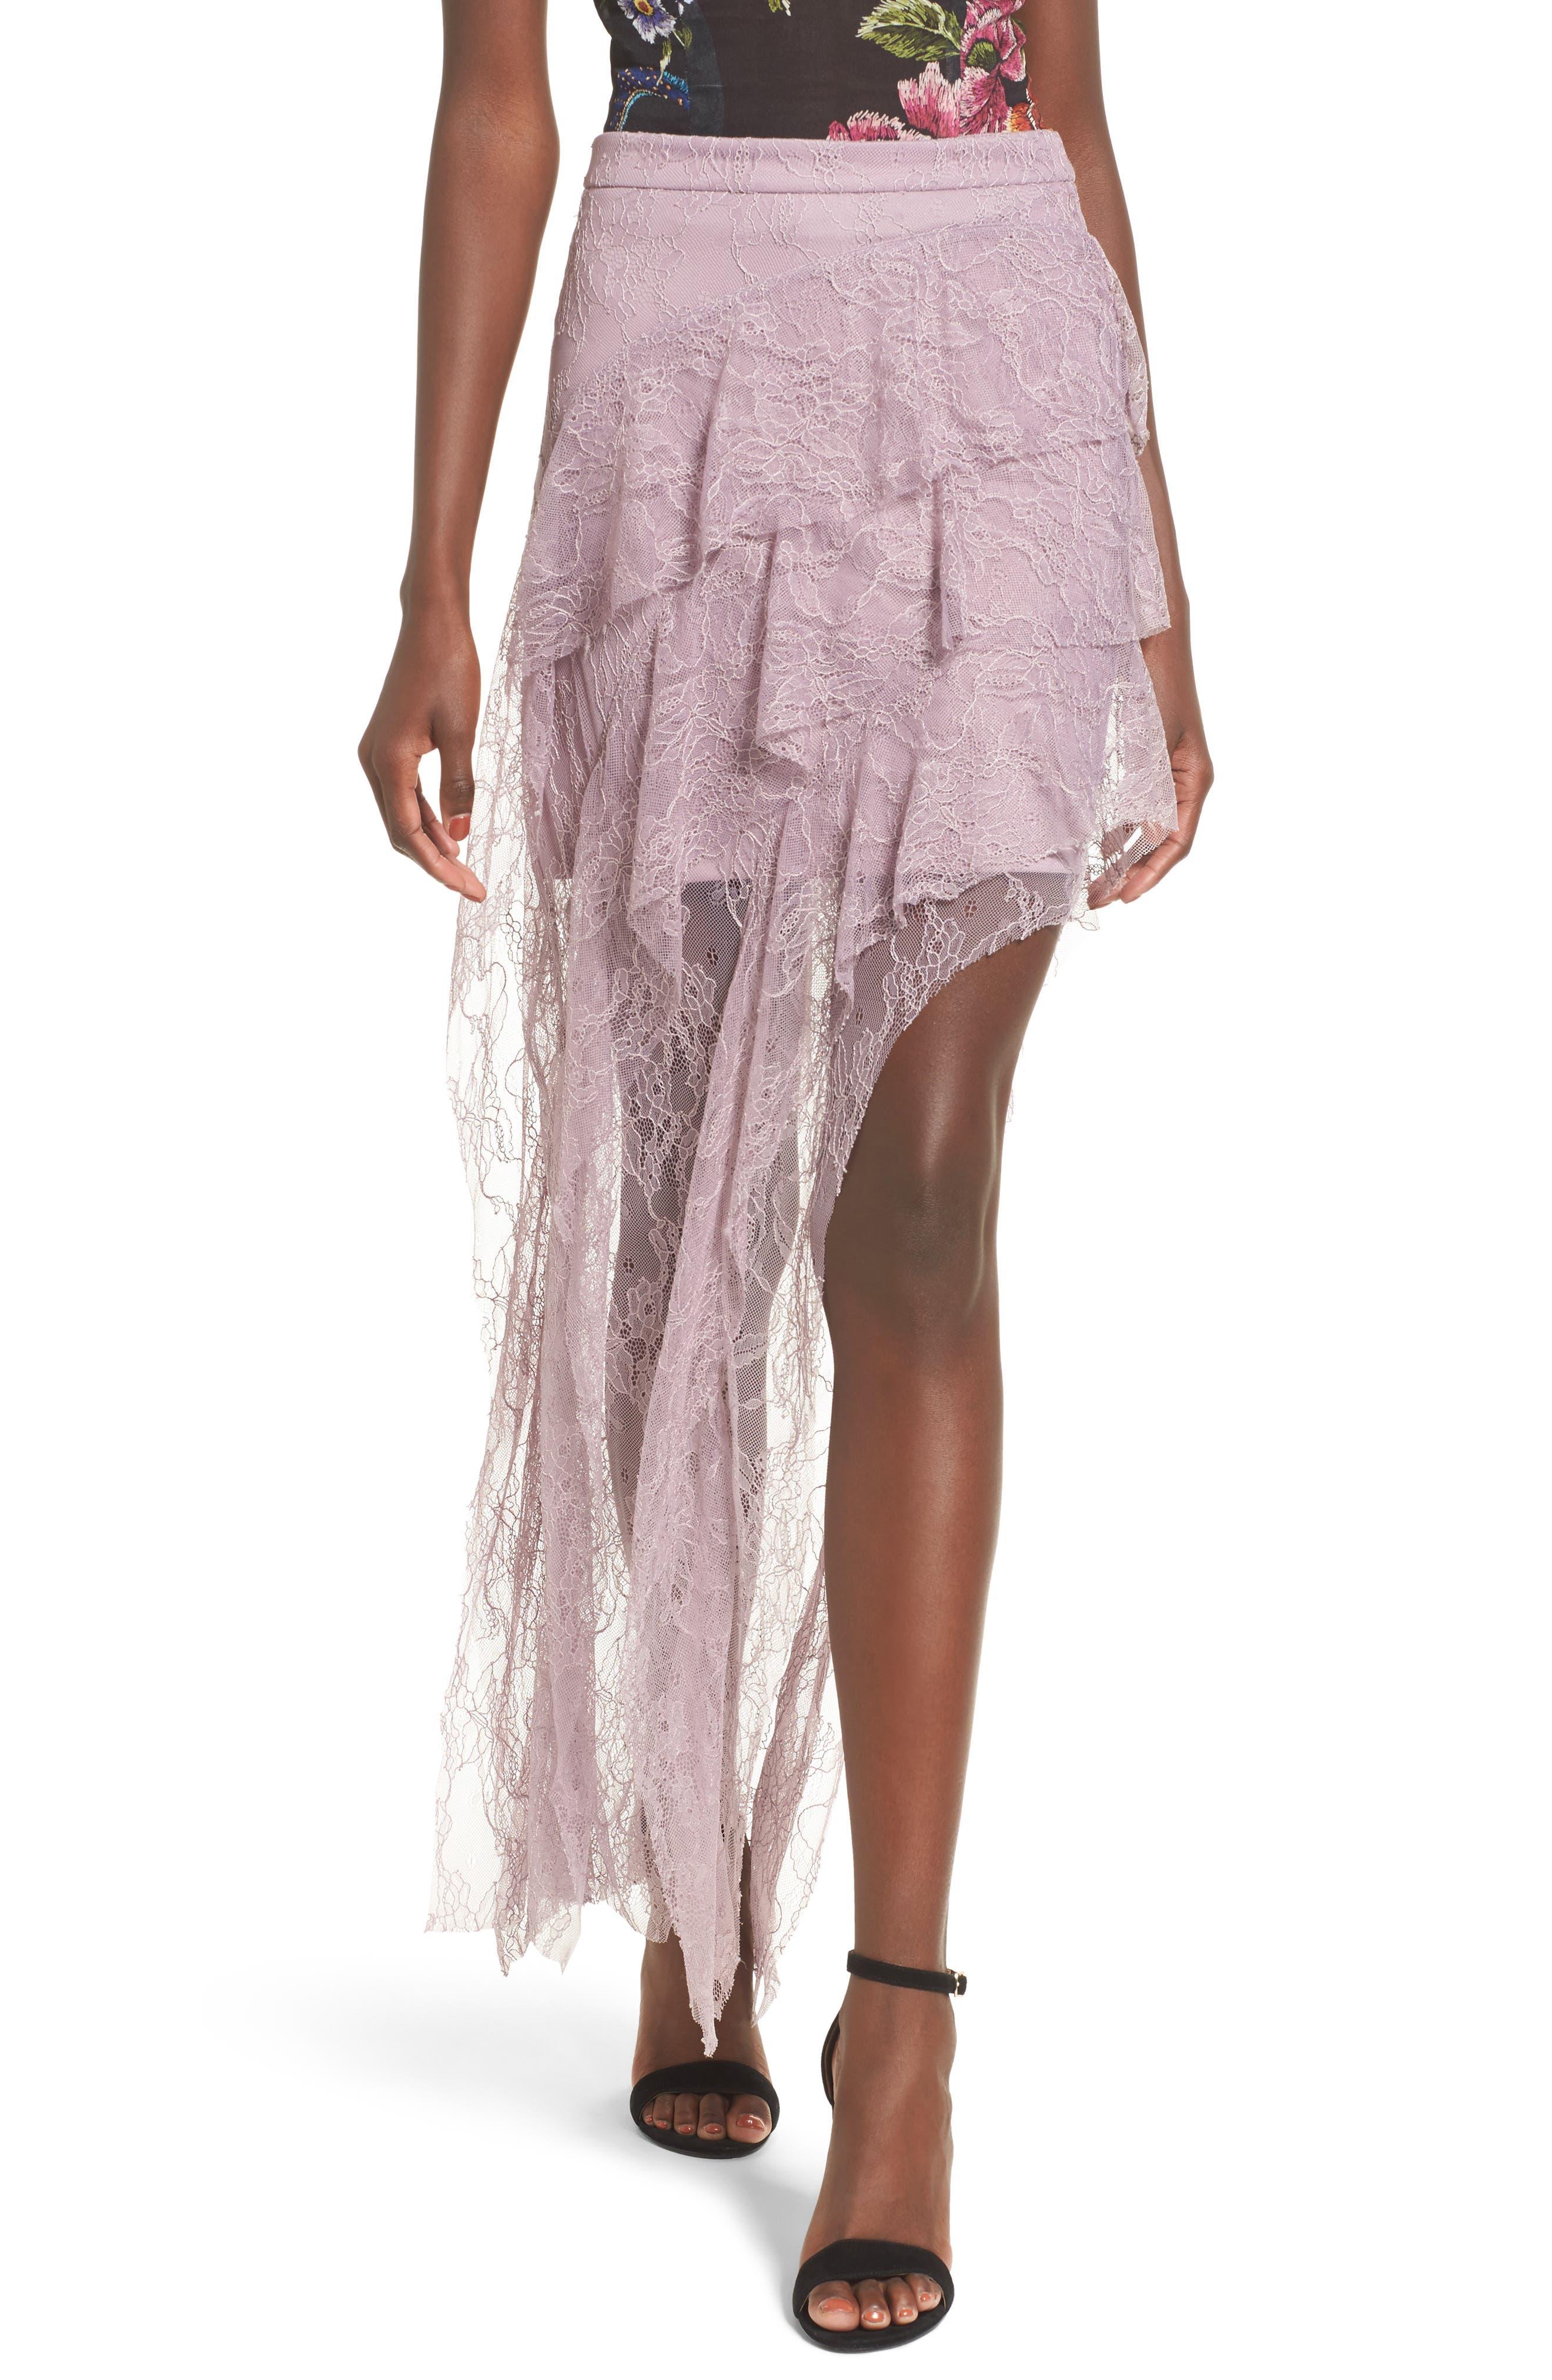 Main Image - AFRM Emilia Ruffle Maxi Skirt